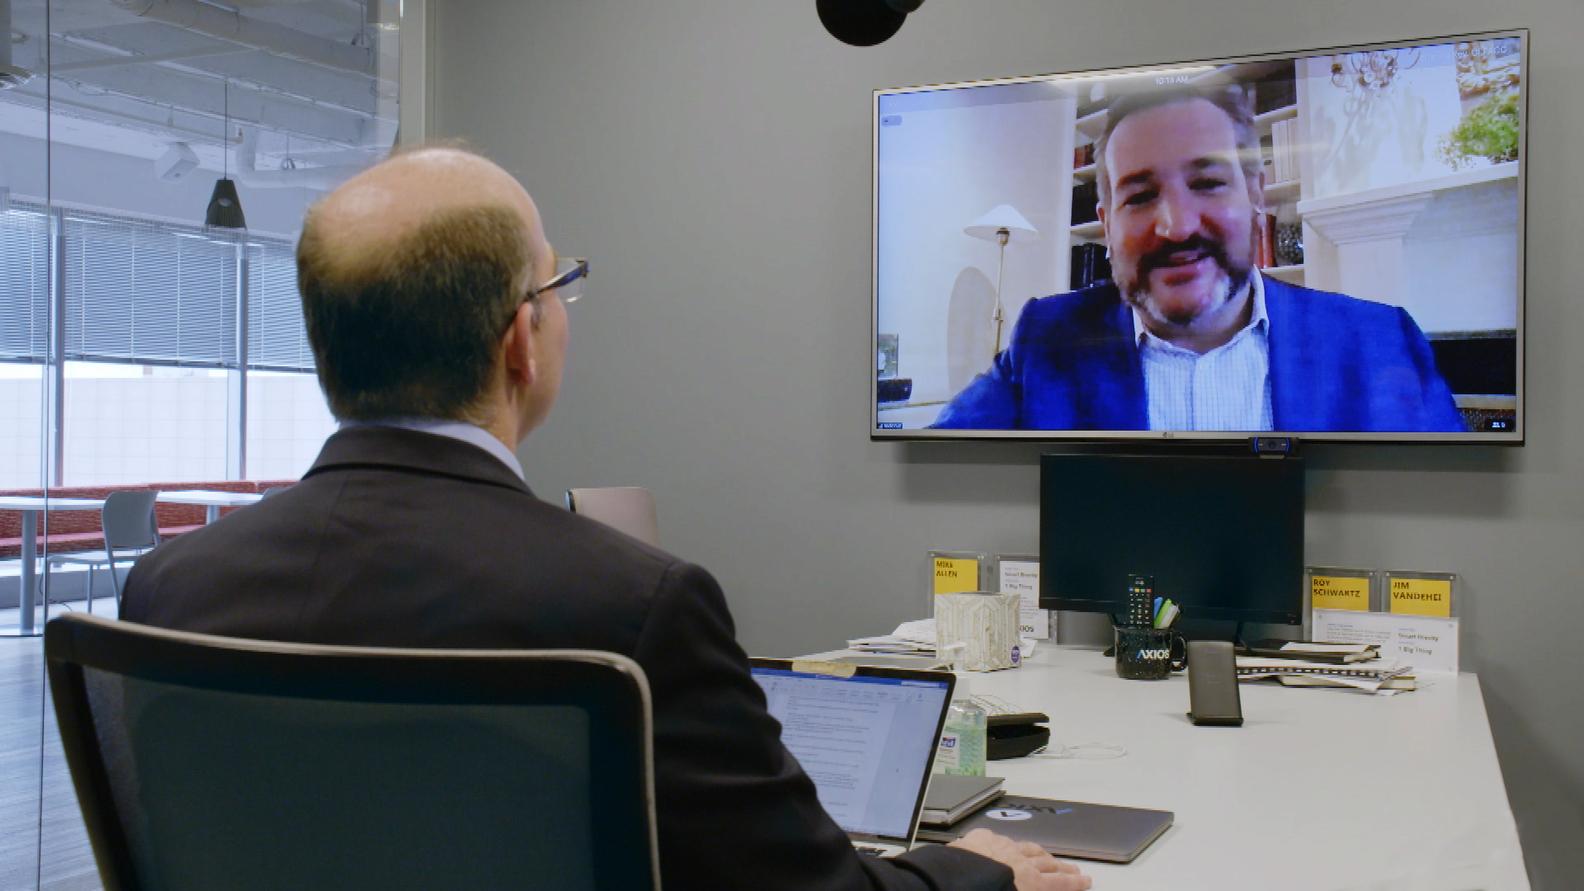 Axios co-founder Mike Allen interviewing Senator Ted Cruz (R-TX)